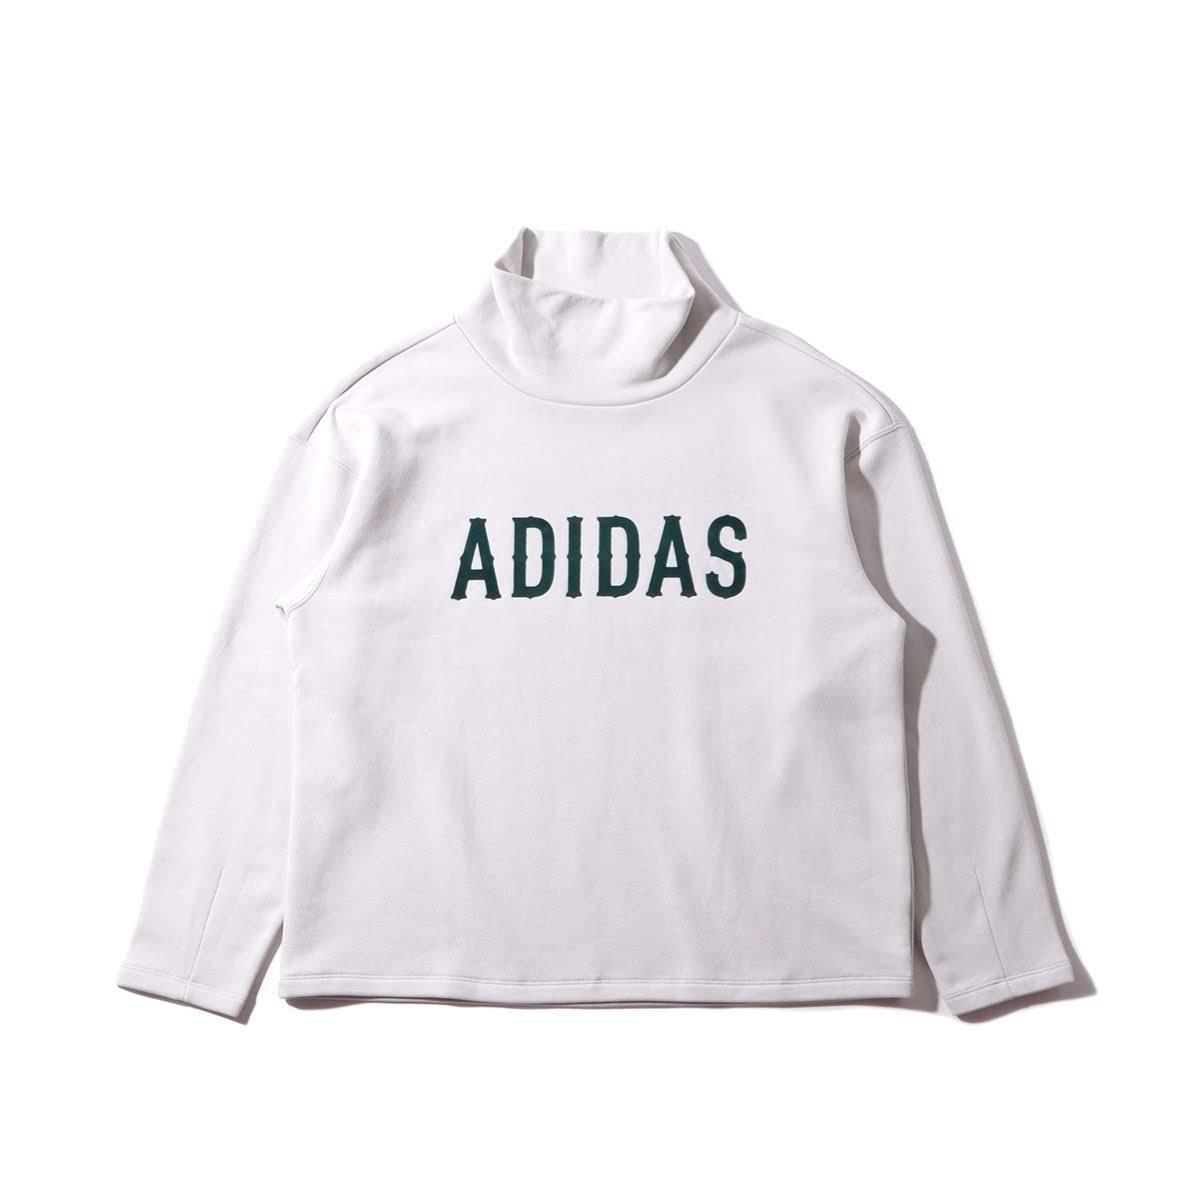 adidas Originals SWEATER(アディダスオリジナルス セーター)RAW WHITE【レディース セーター】19SS-I